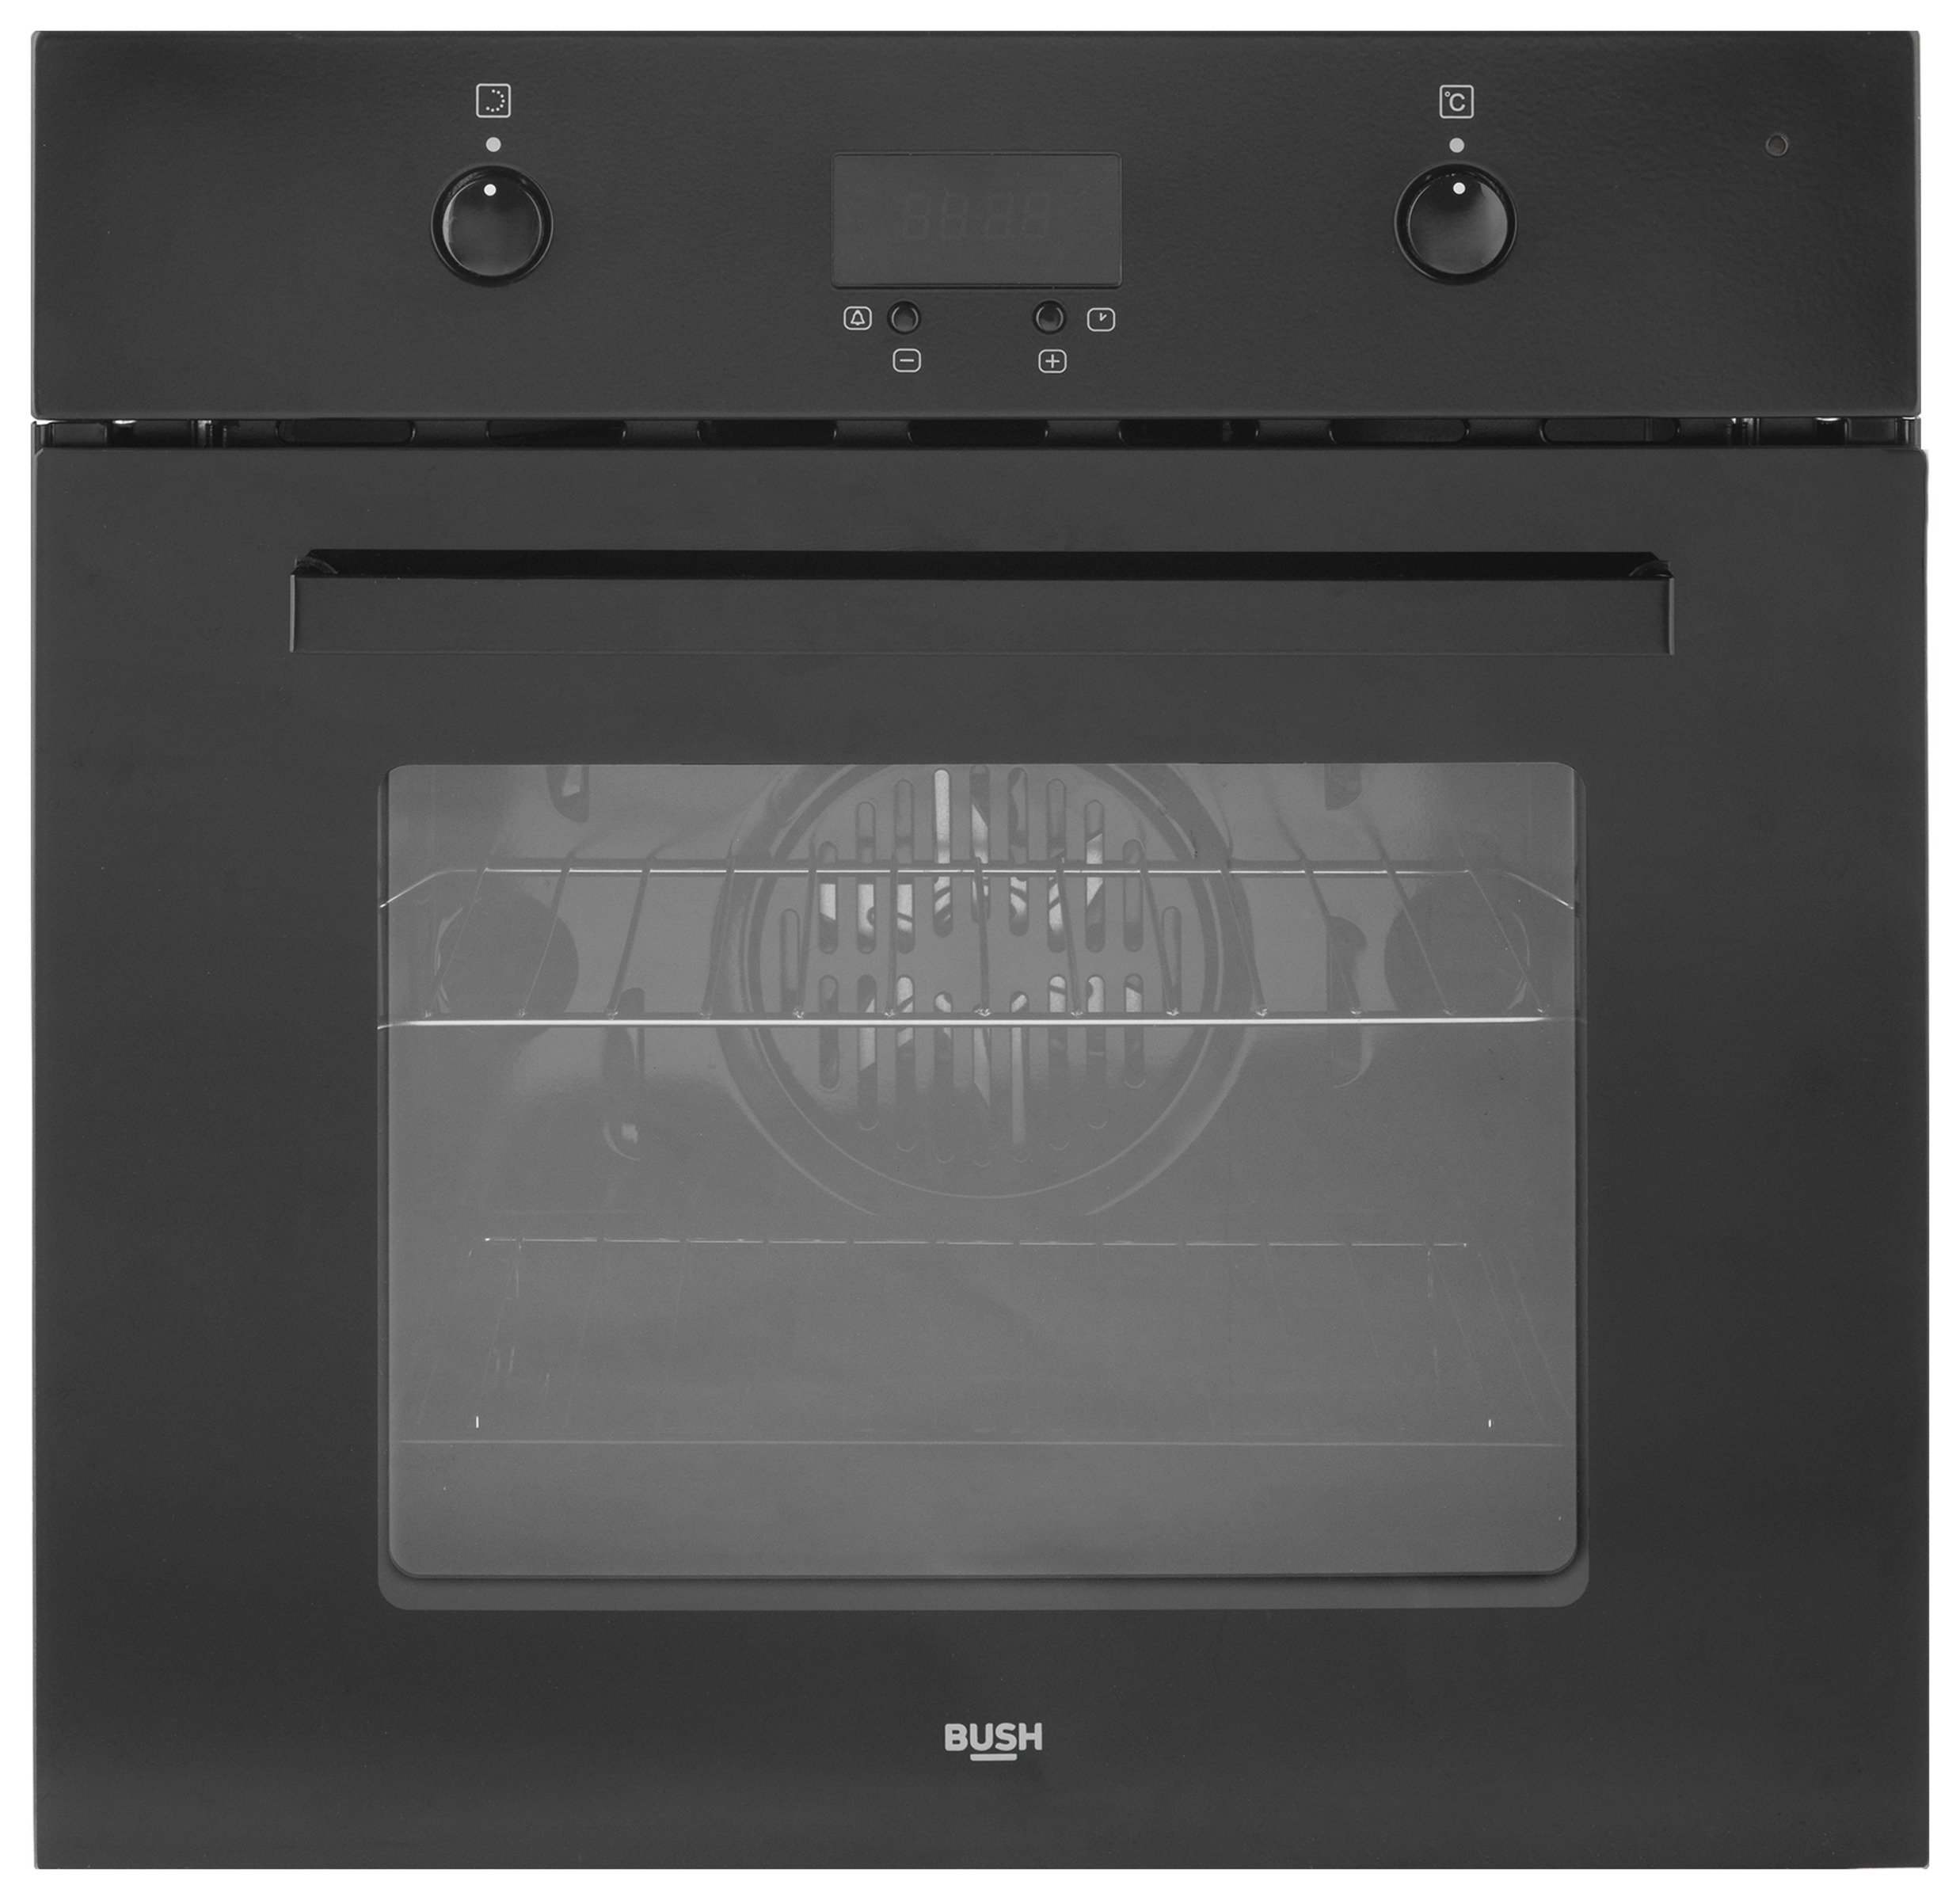 bush-bsobfb-single-multifunction-electric-fan-oven-black